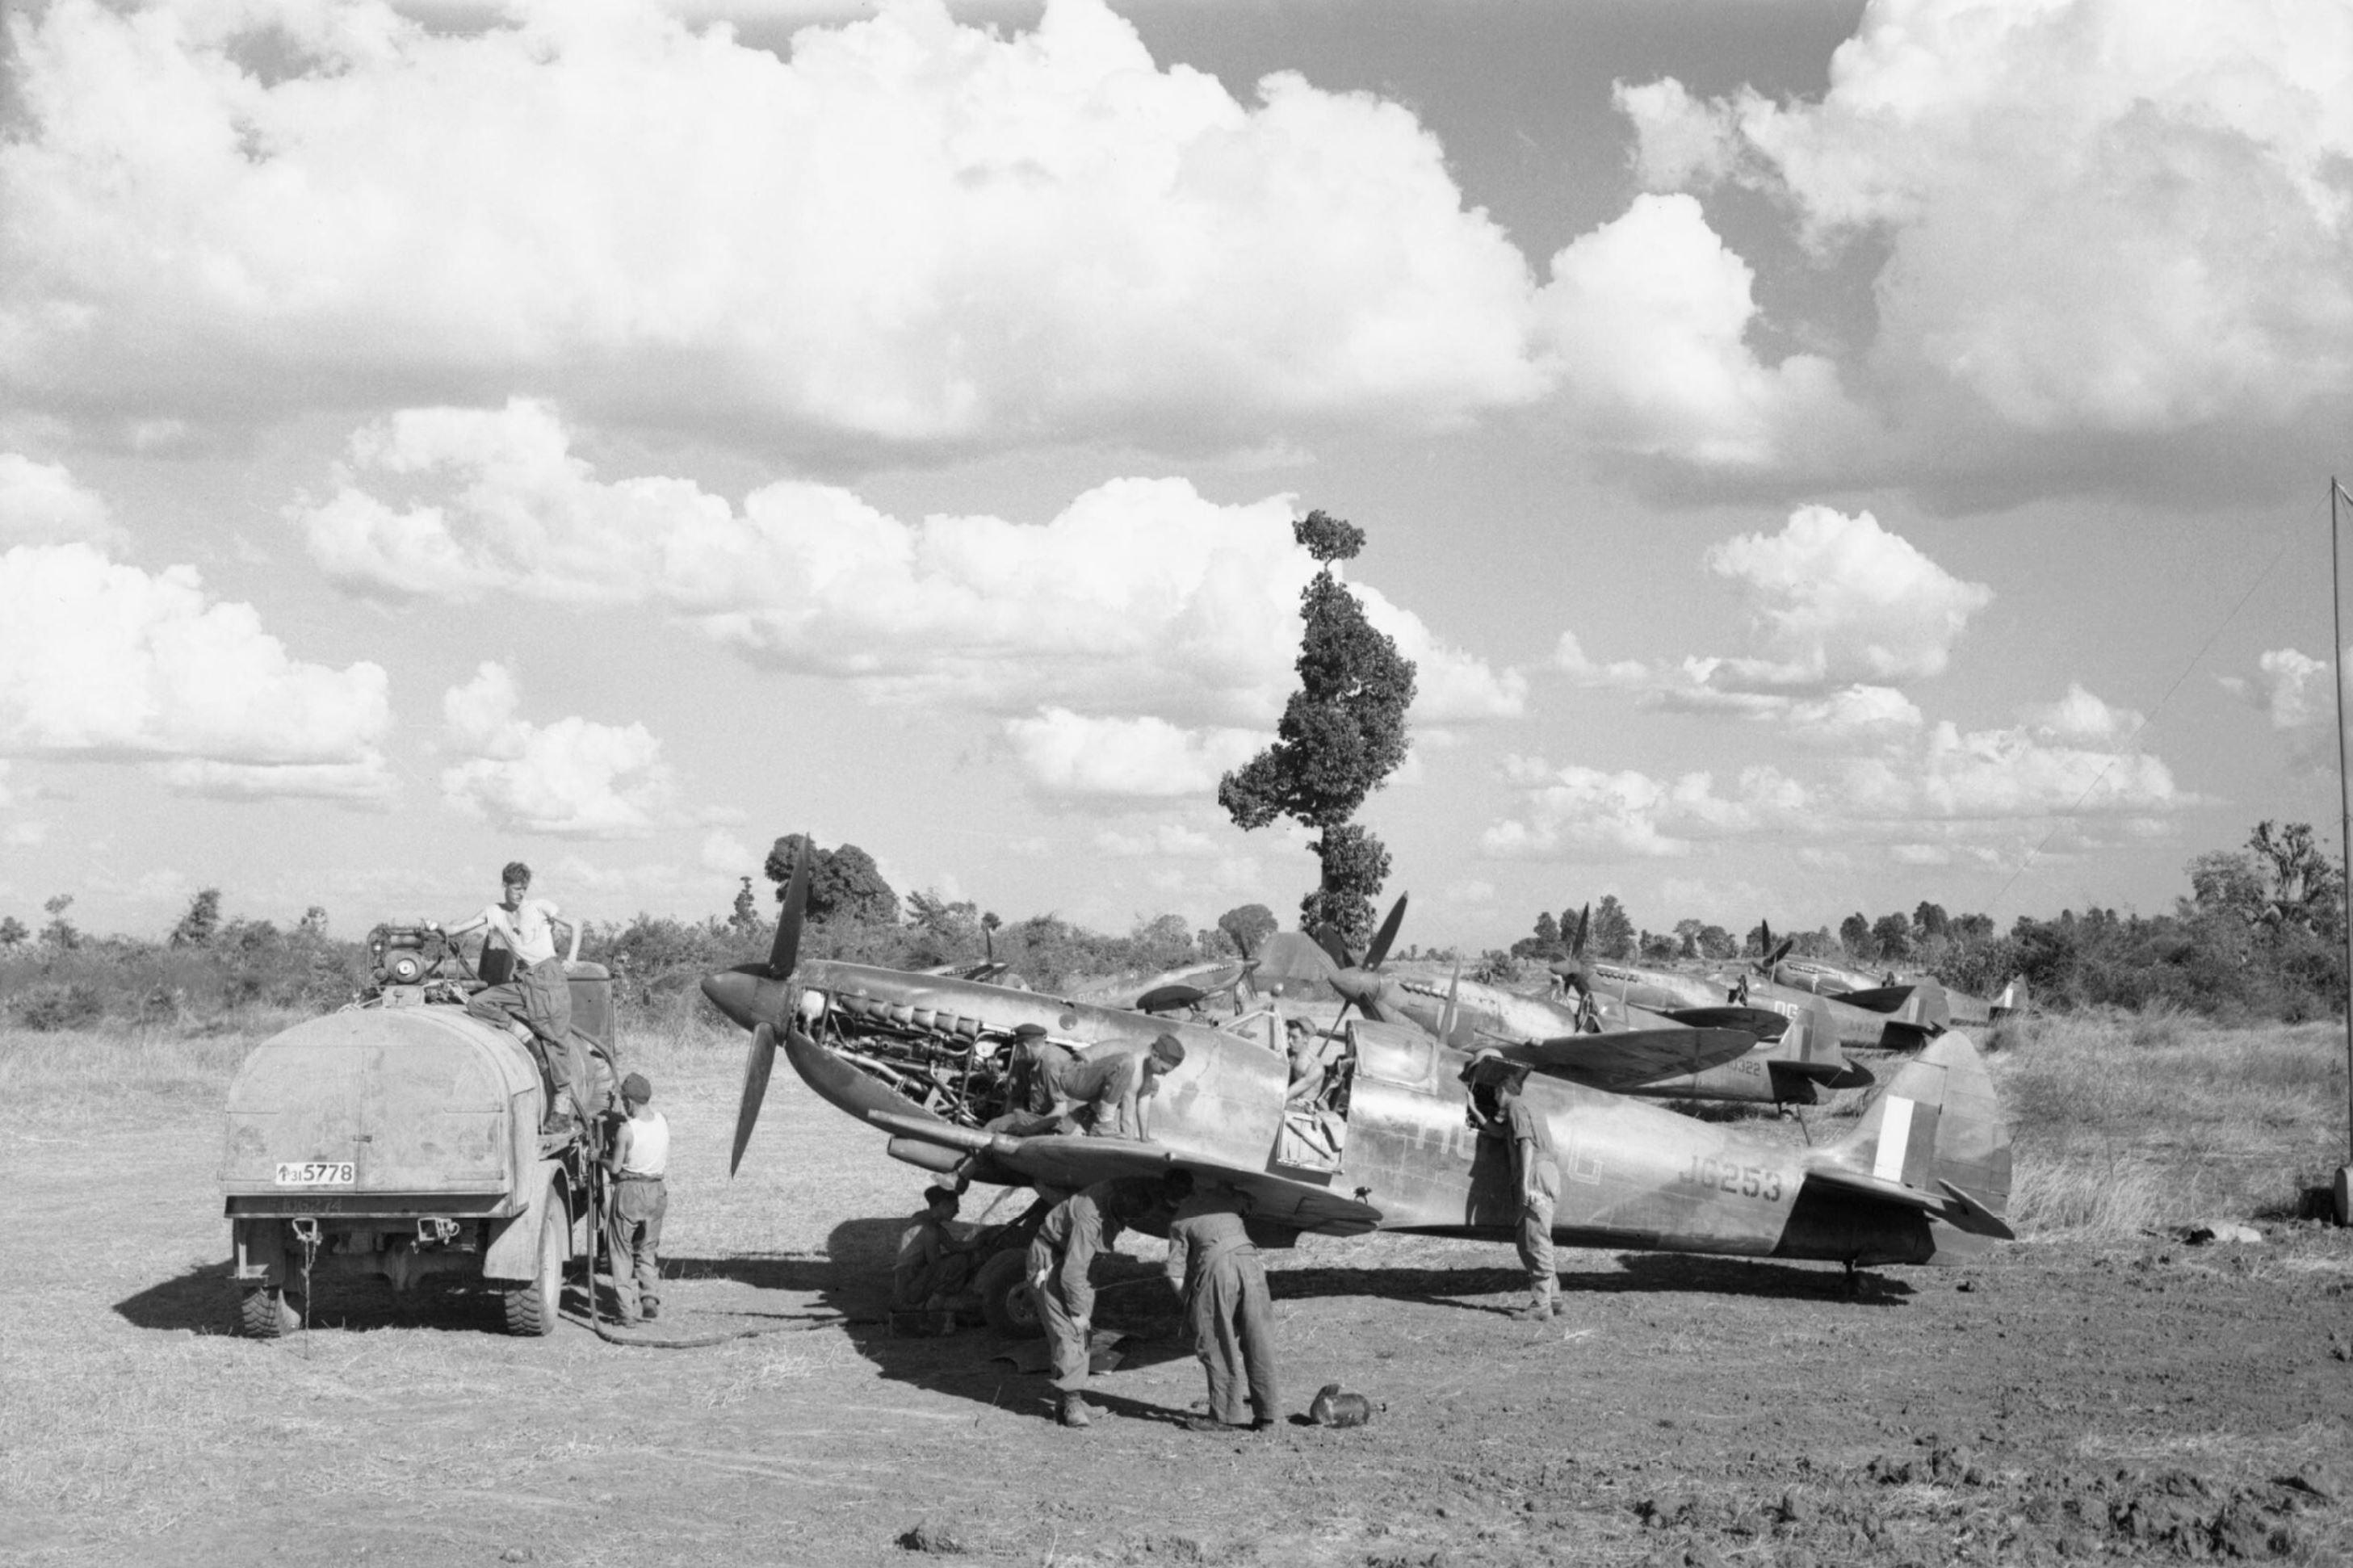 Spitfire MkVIII RAF 155Sqn DGV foreground at Tabingaung 1944 IWM CF269